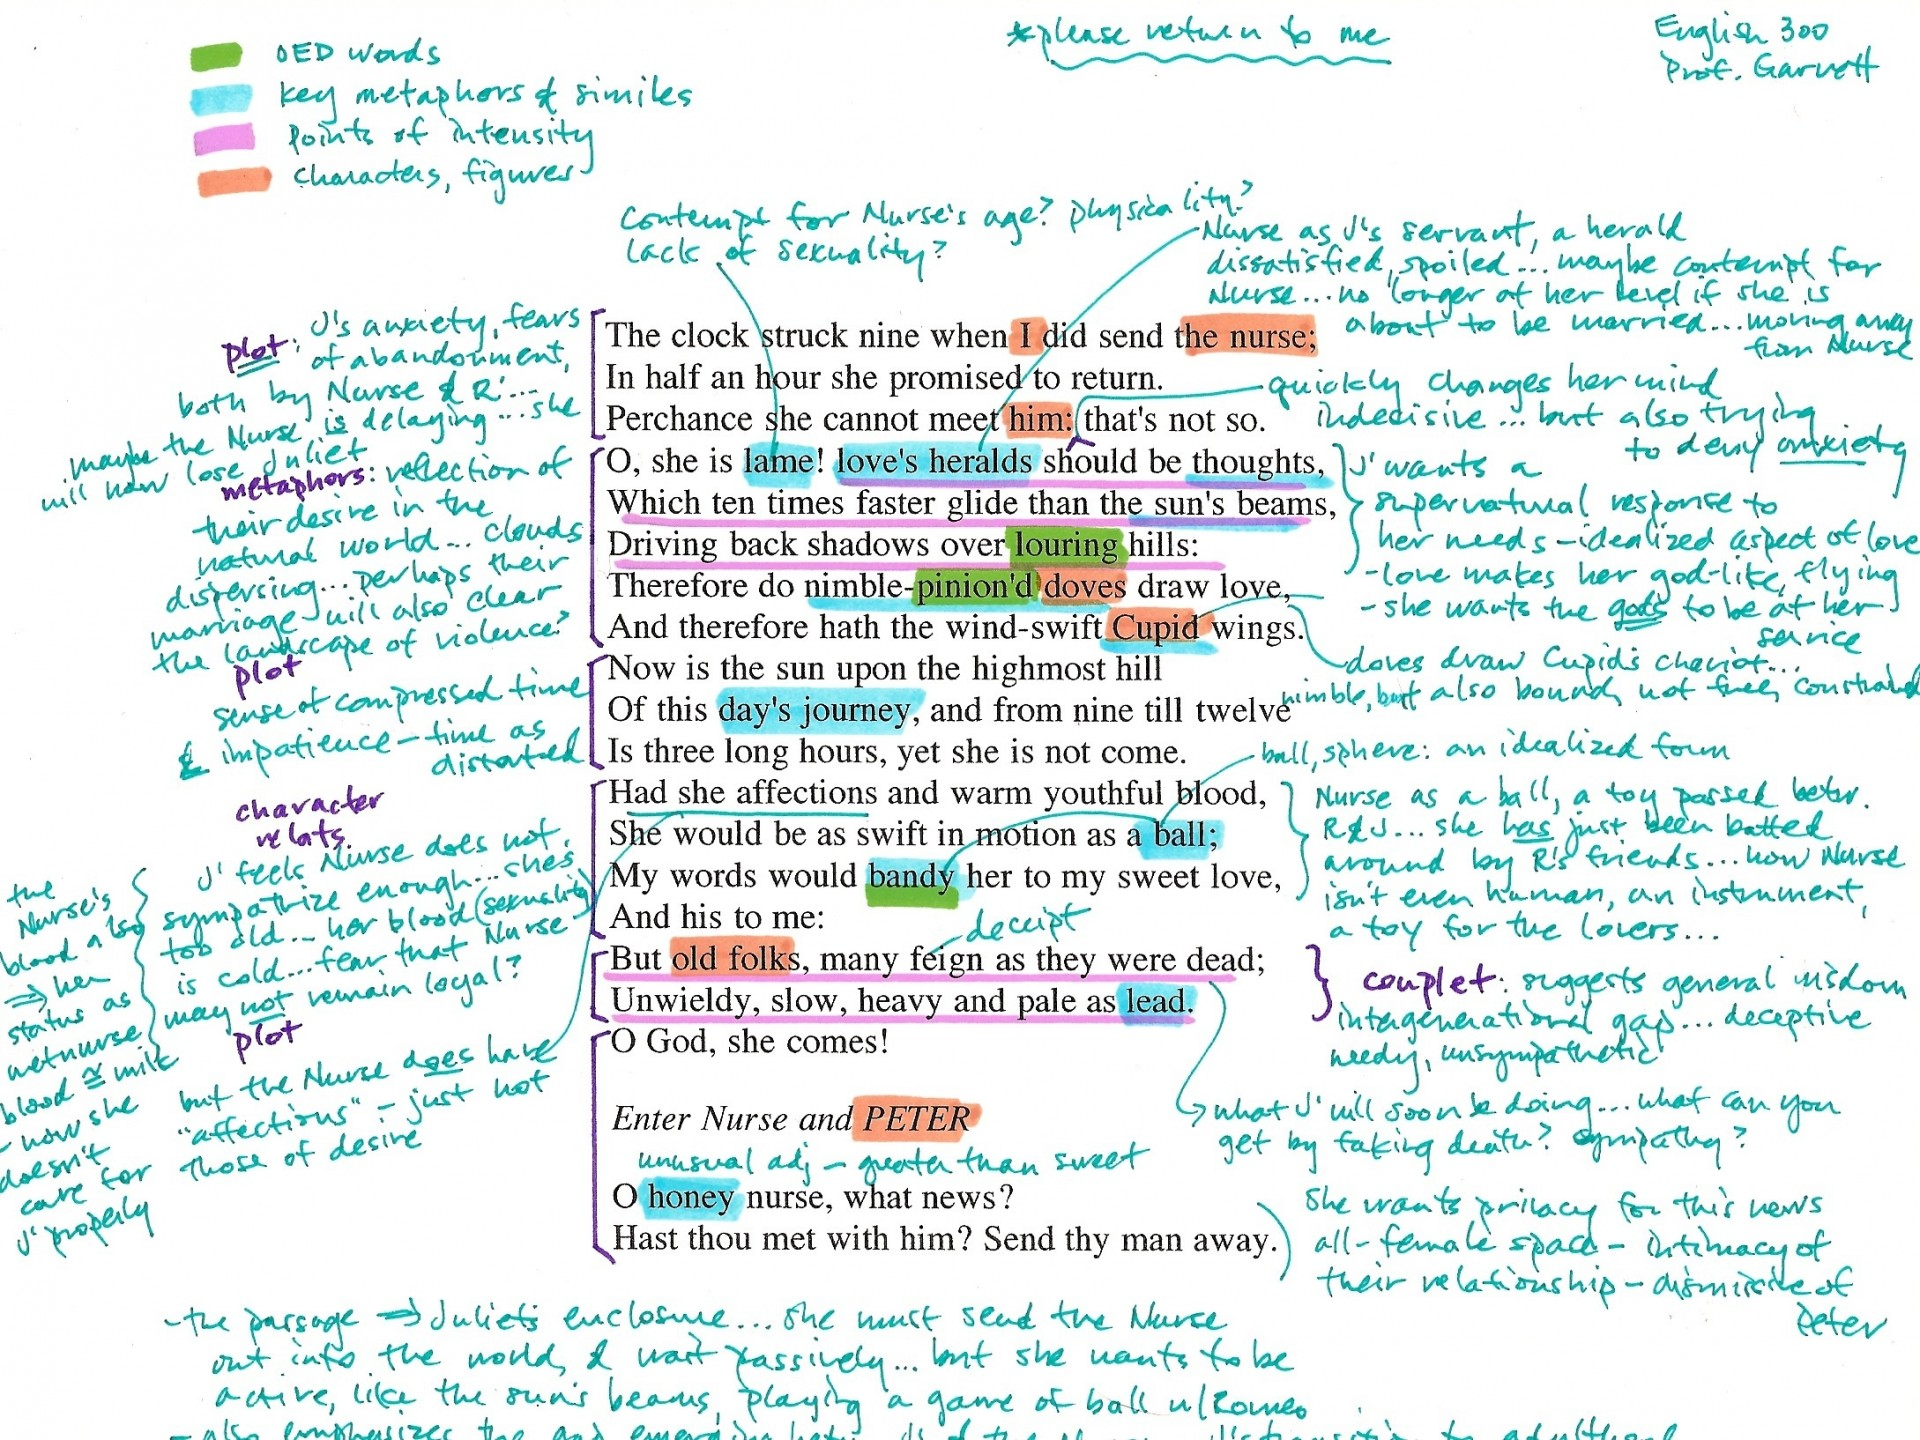 Dissertation proposal writing help for kids worksheets